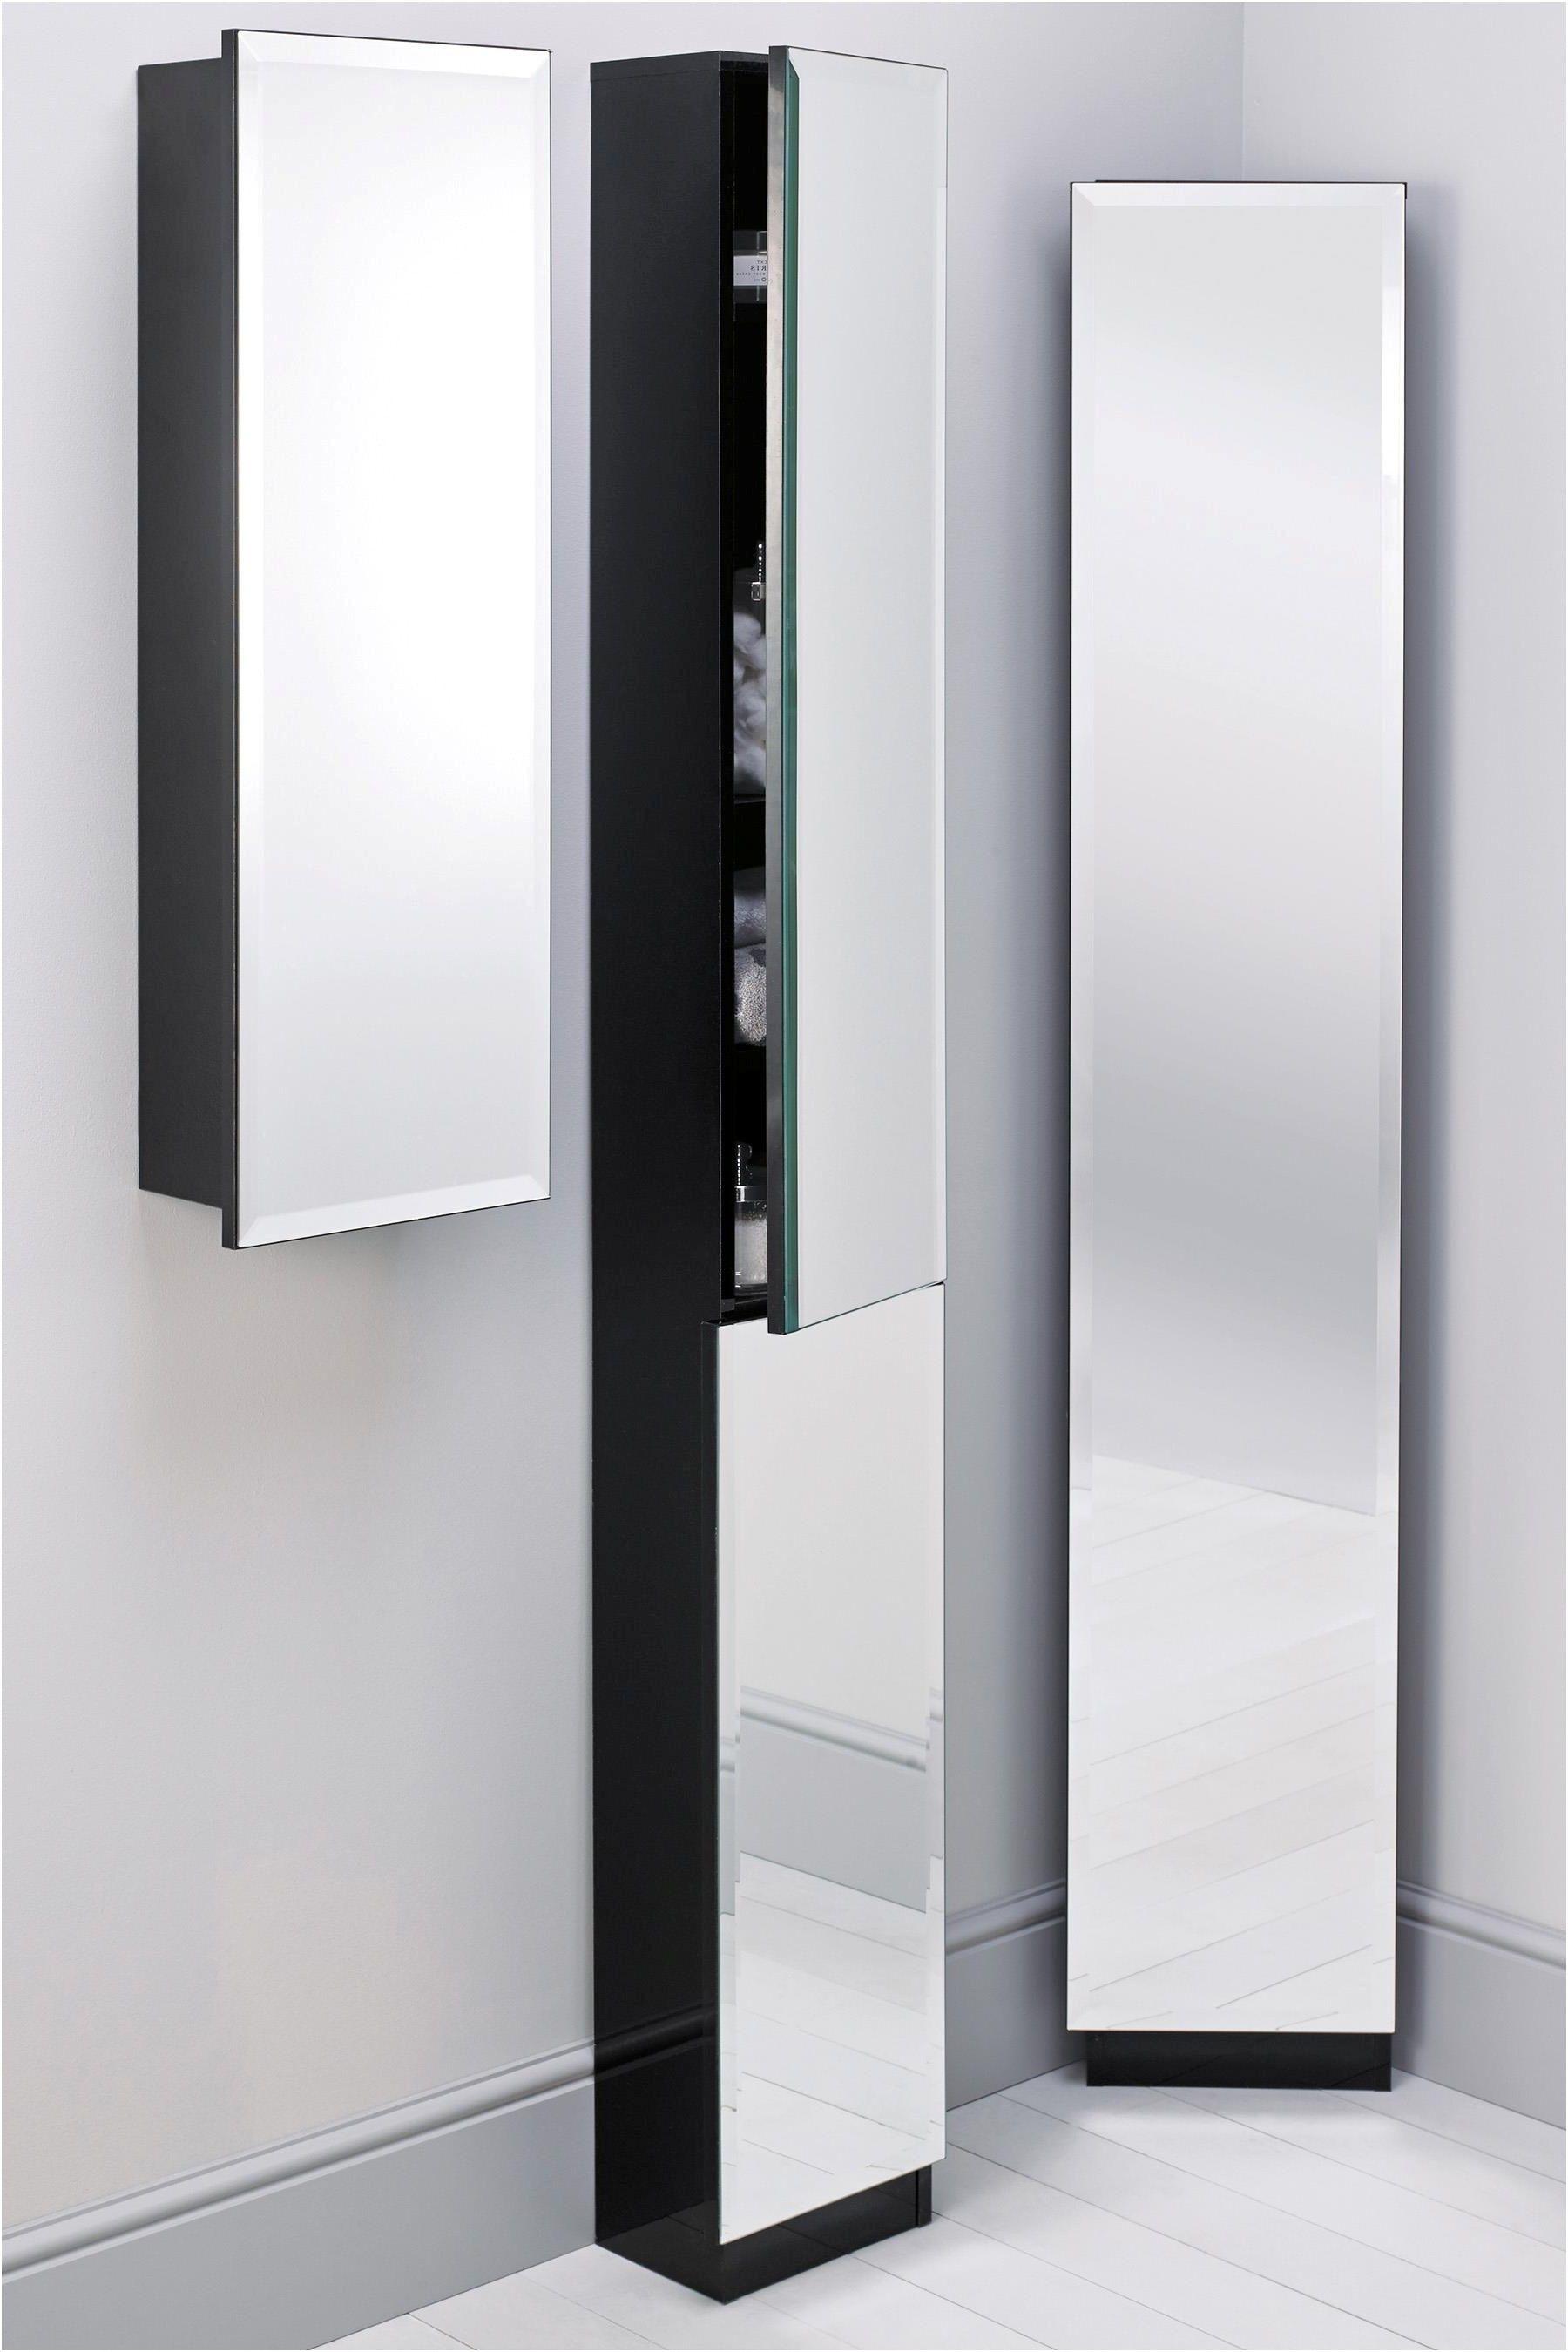 mirror design ideas tall ideas mirrored corner bathroom cabinet from ...